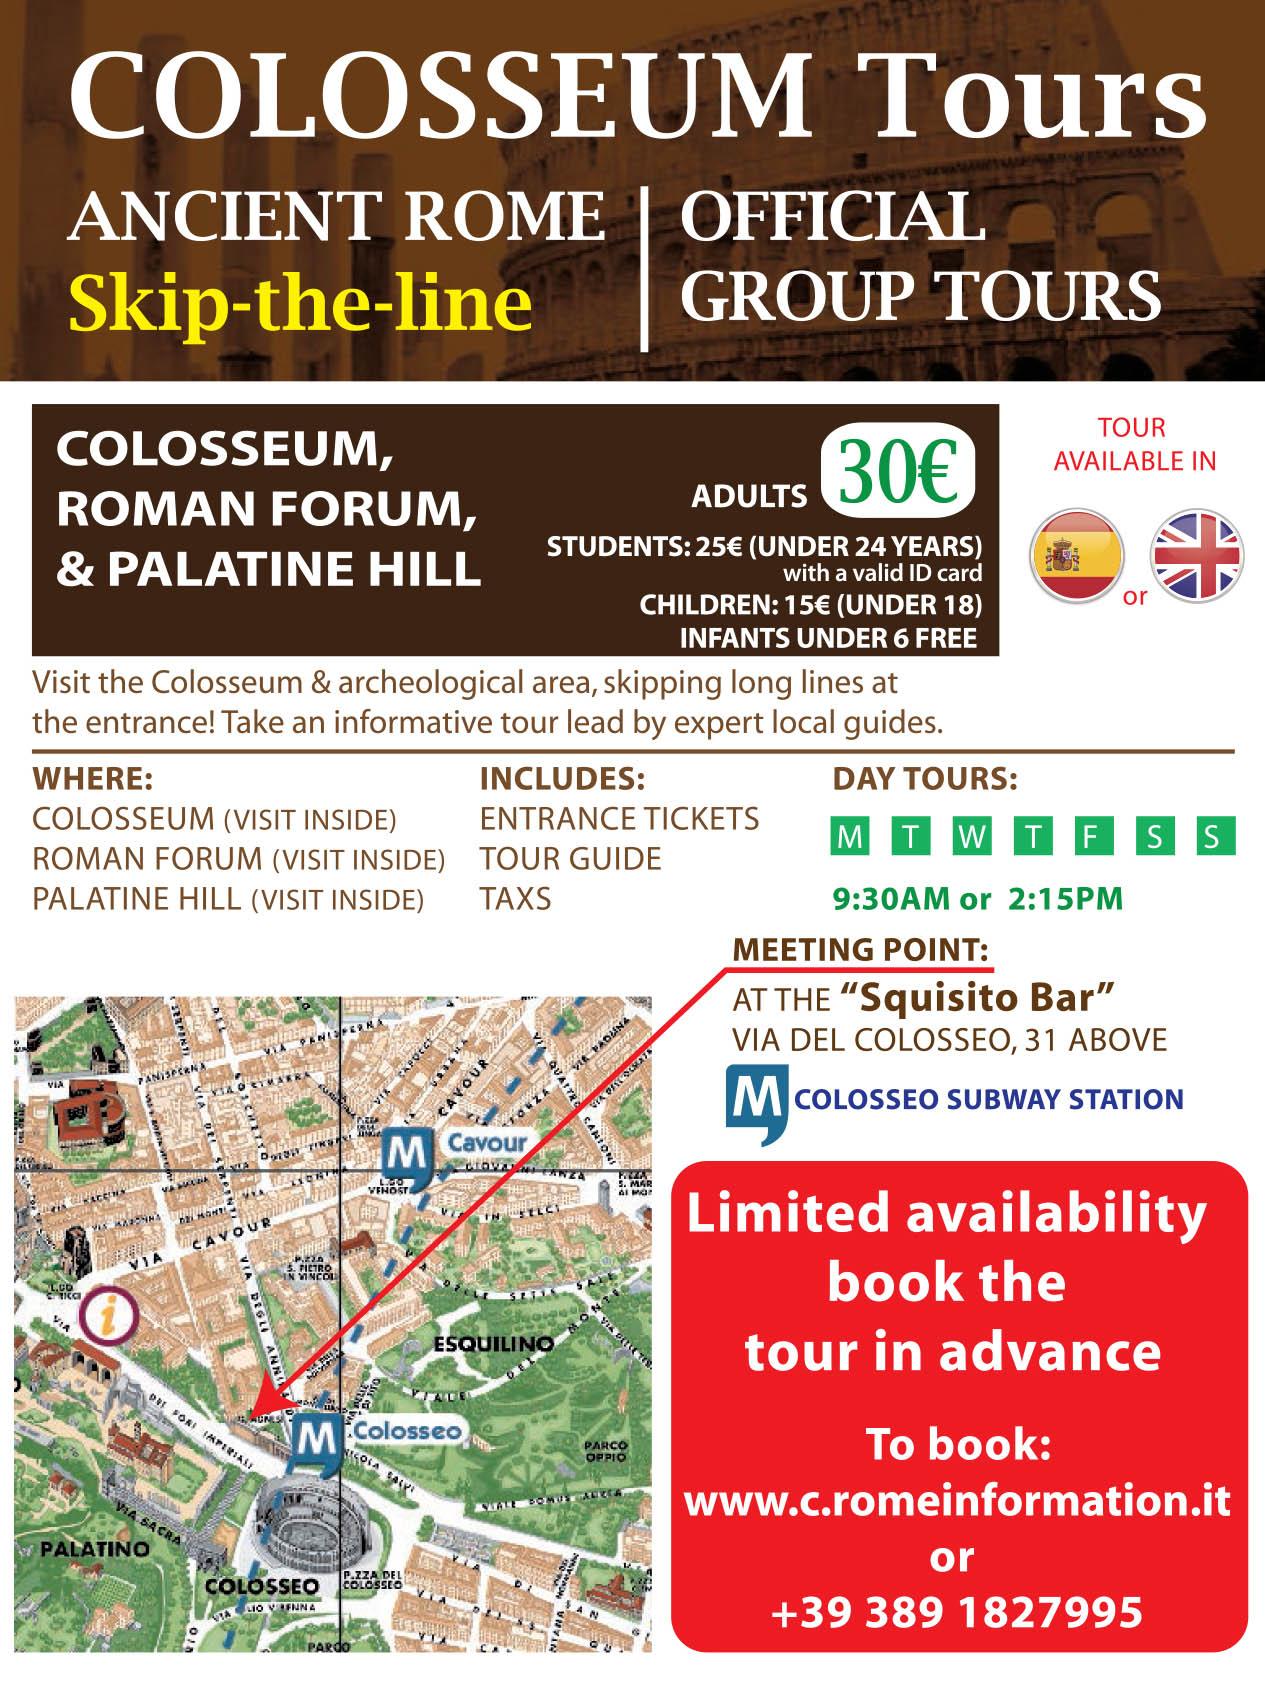 Colosseum Tour - Colosseum official guided Tour - Skip the ...